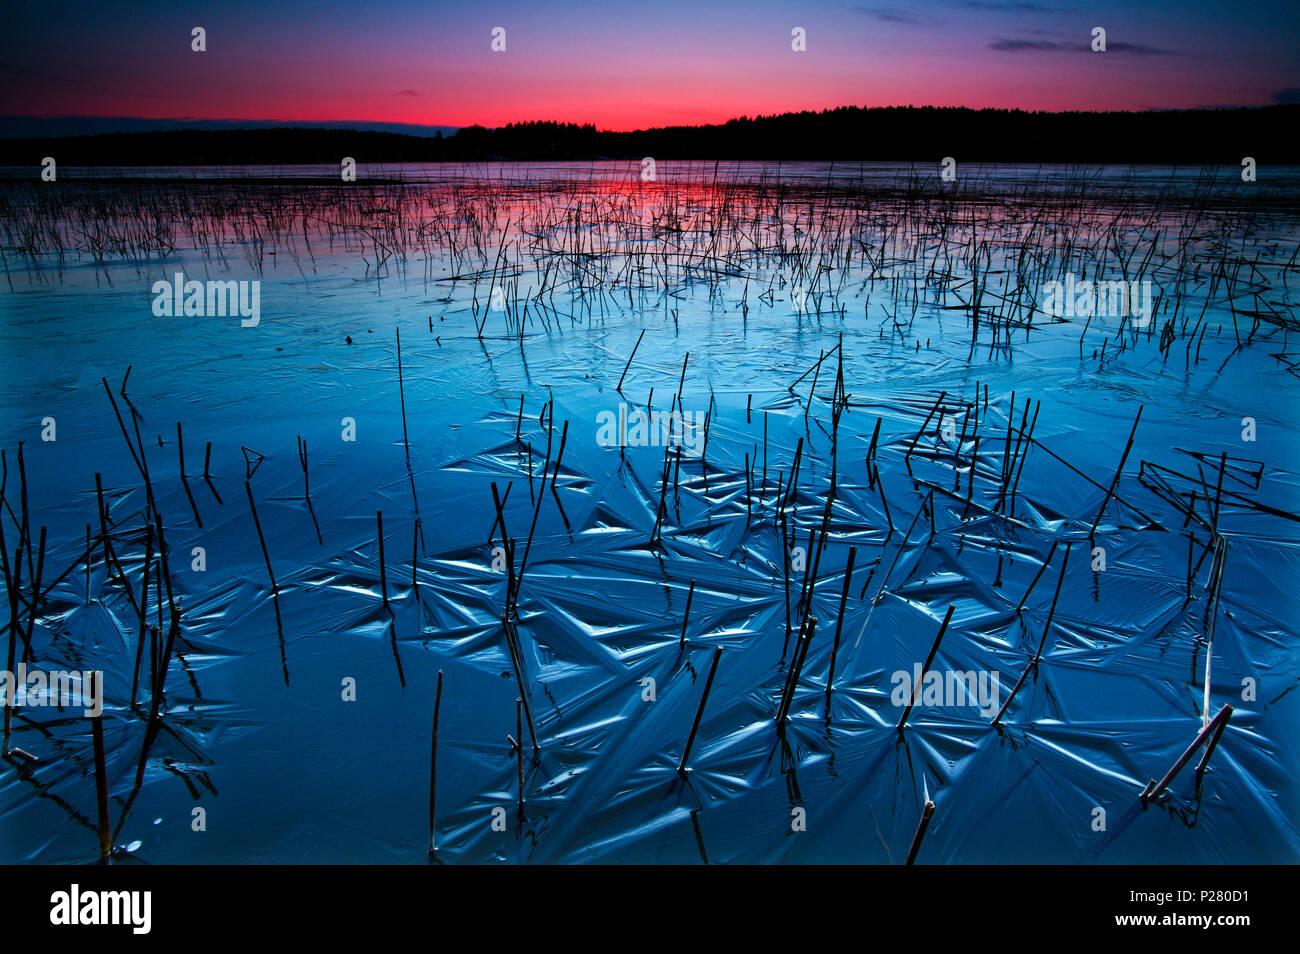 Bella serata invernale dal lago Vansjø, Østfold, Norvegia. Immagini Stock